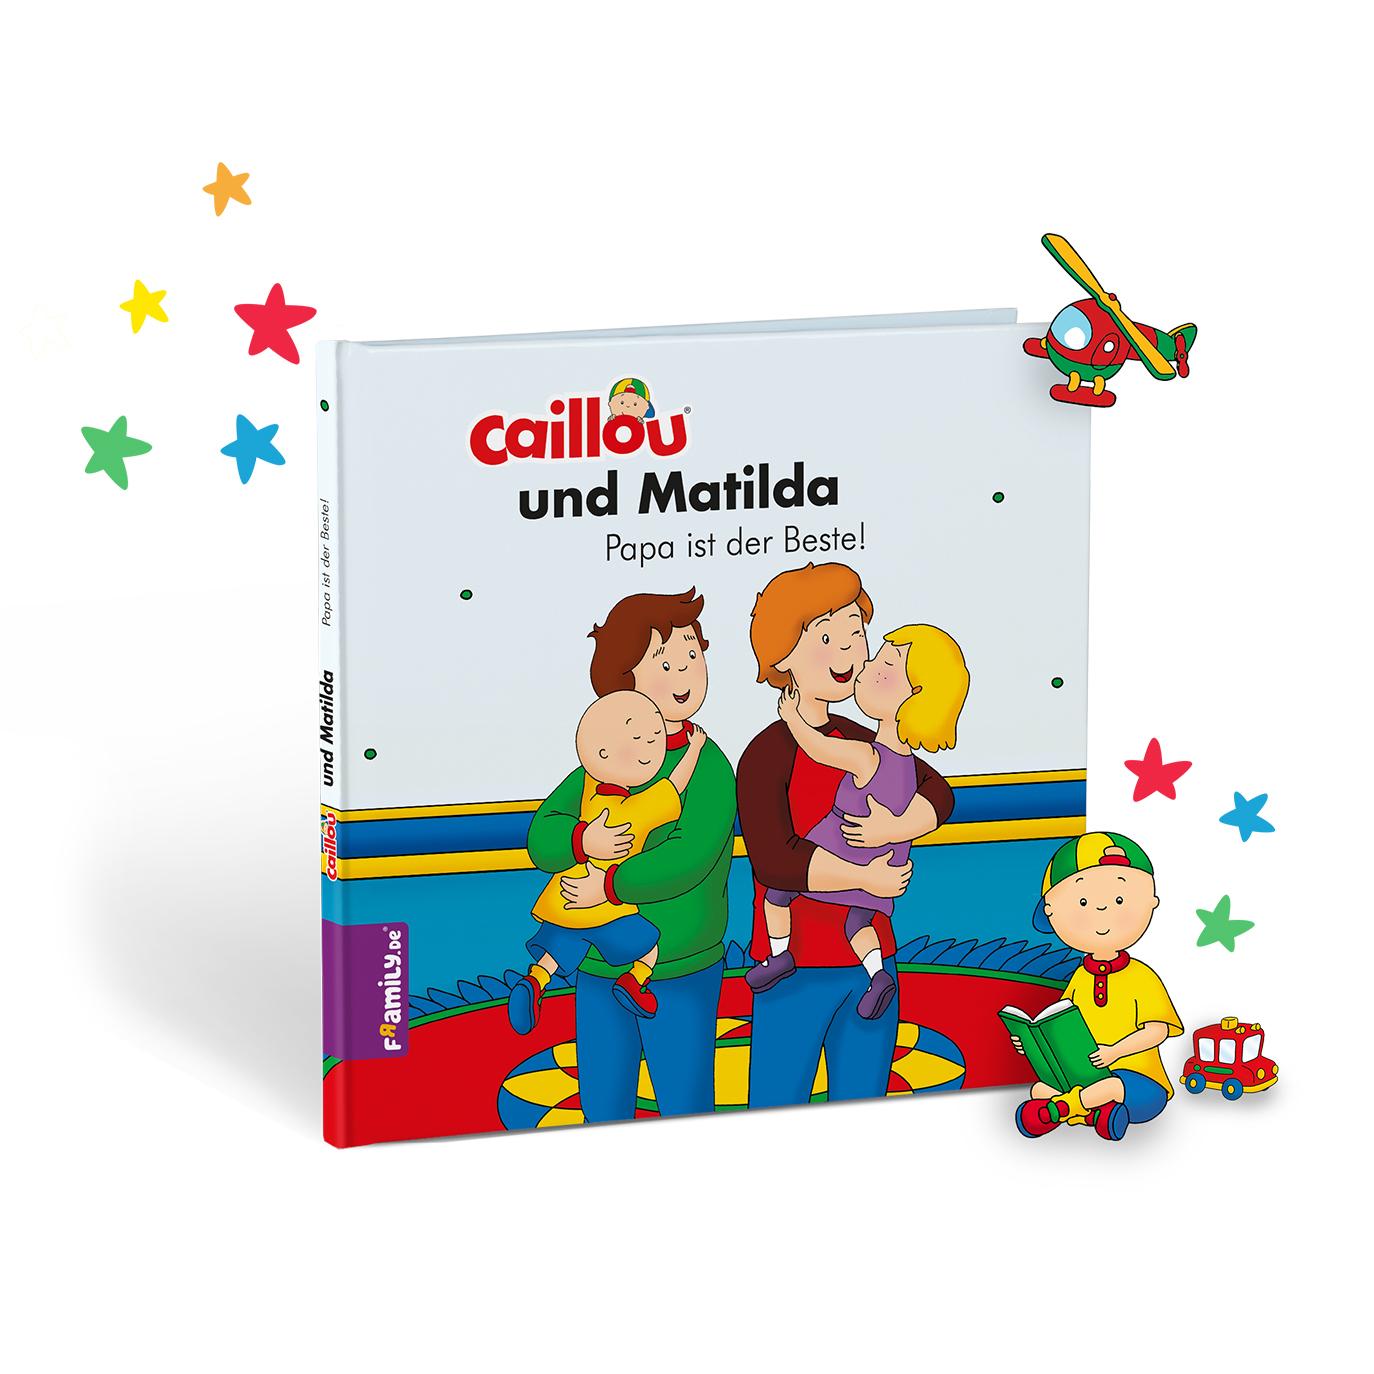 Caillou - personalisierte Kinderbuecher